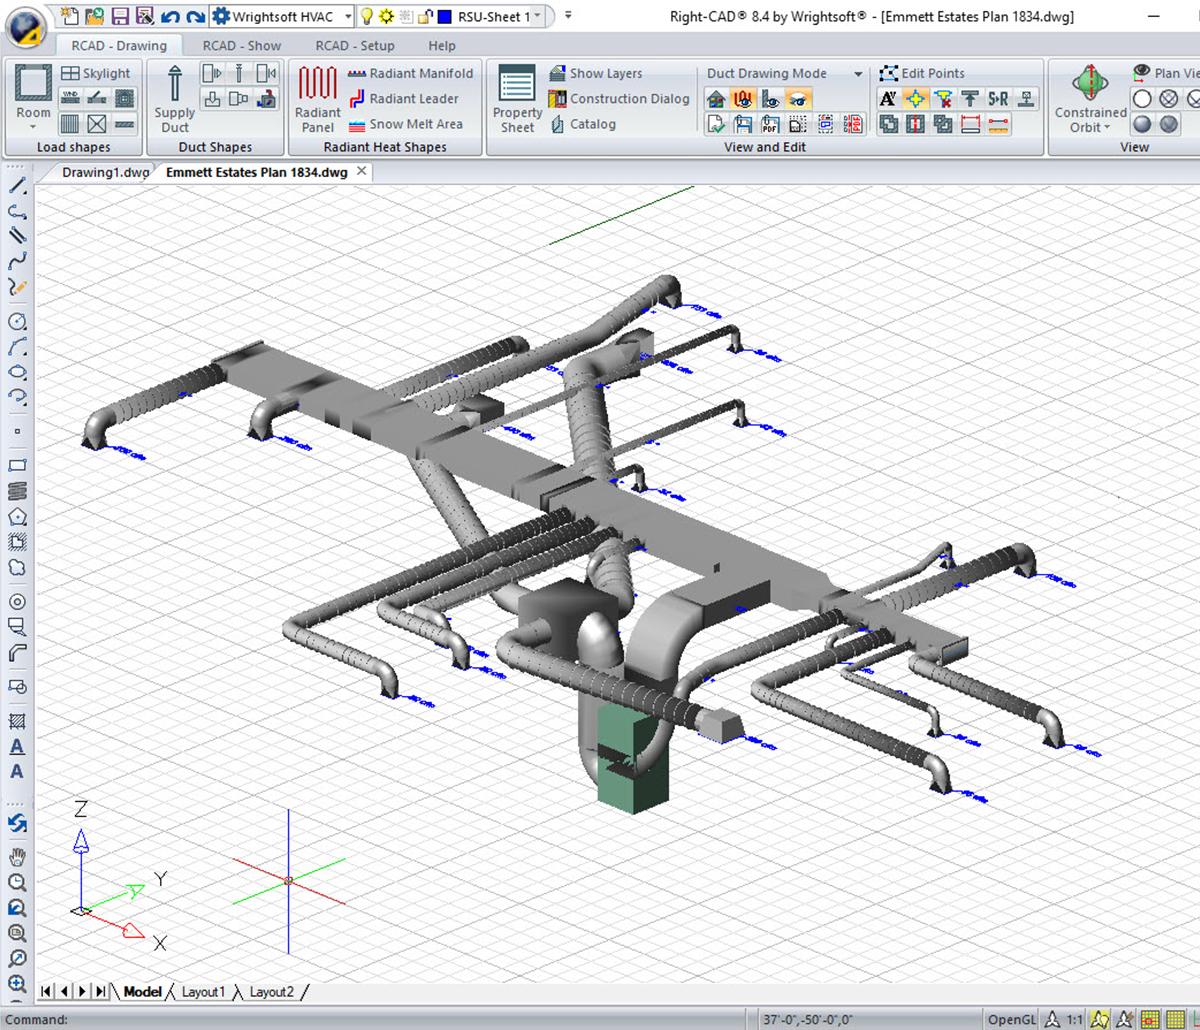 MiTek Wrightsoft 3D HVAC Design Software - Screenshot of Wrightsoft 3D HVAC design software